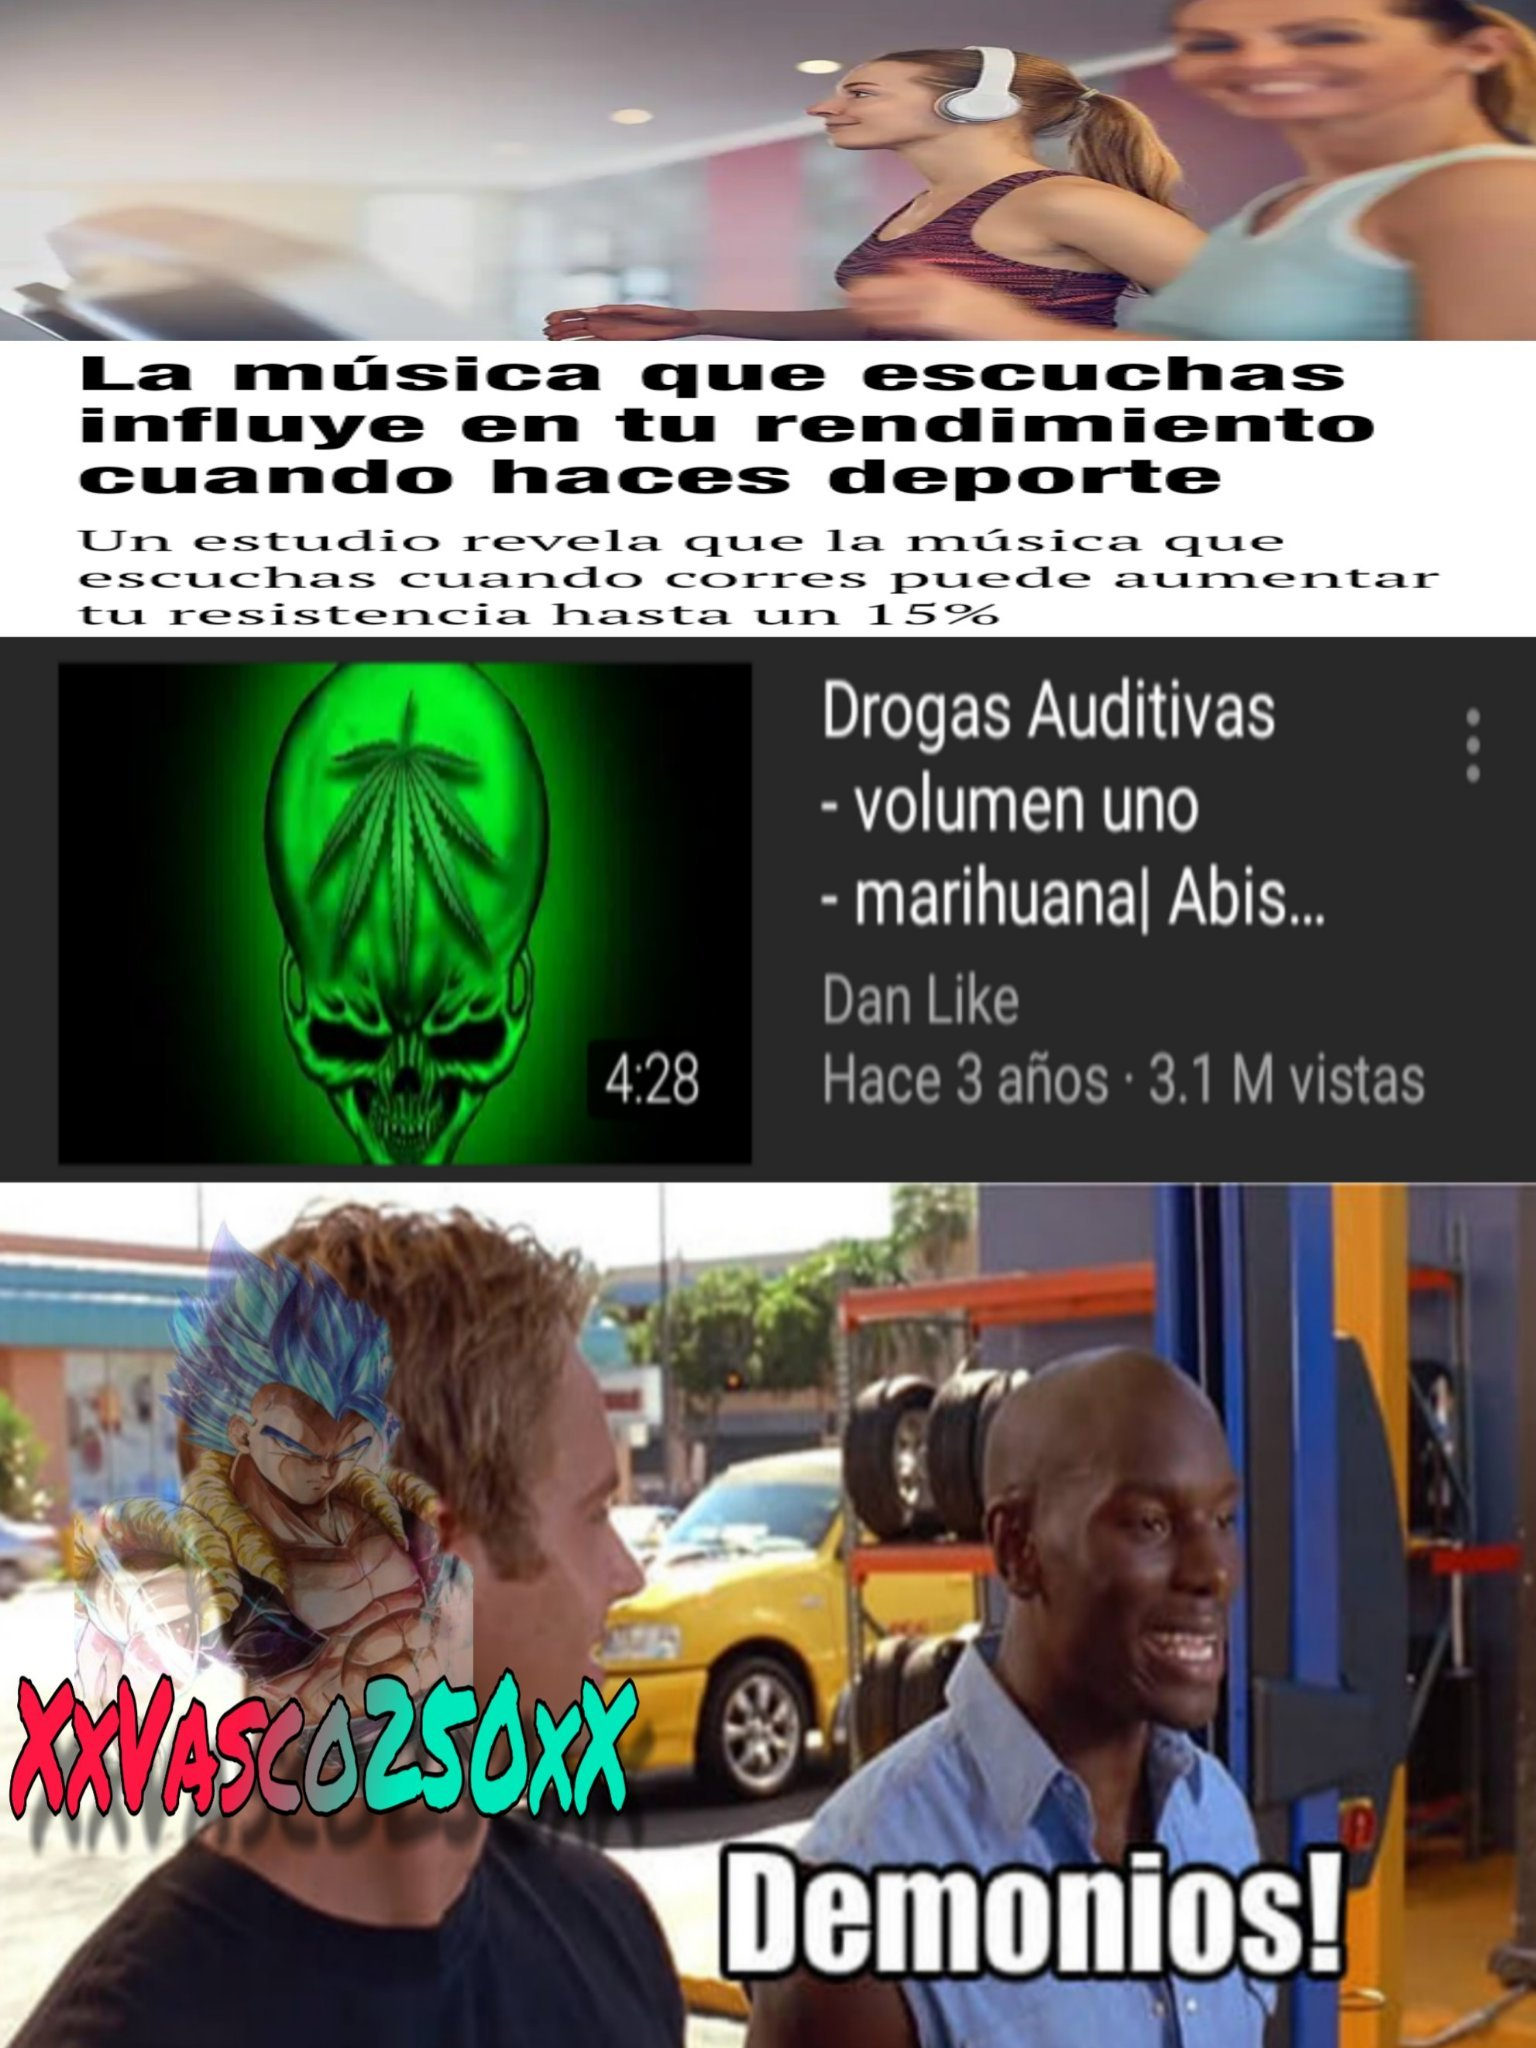 Demonios! - meme